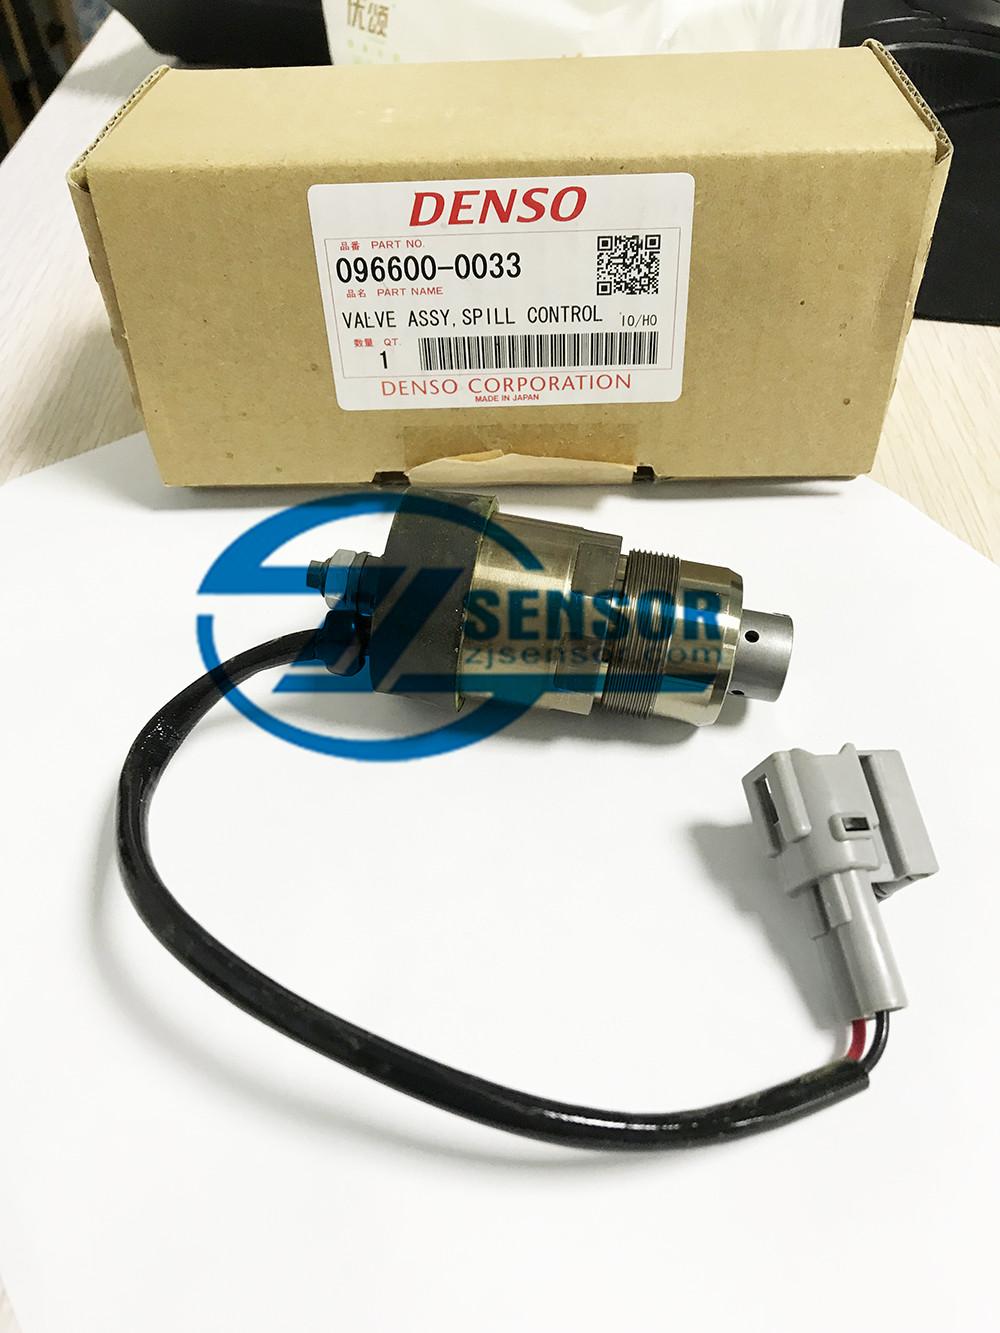 Genuine spill control valve assy 096600-0033,096600 0033,0966000033